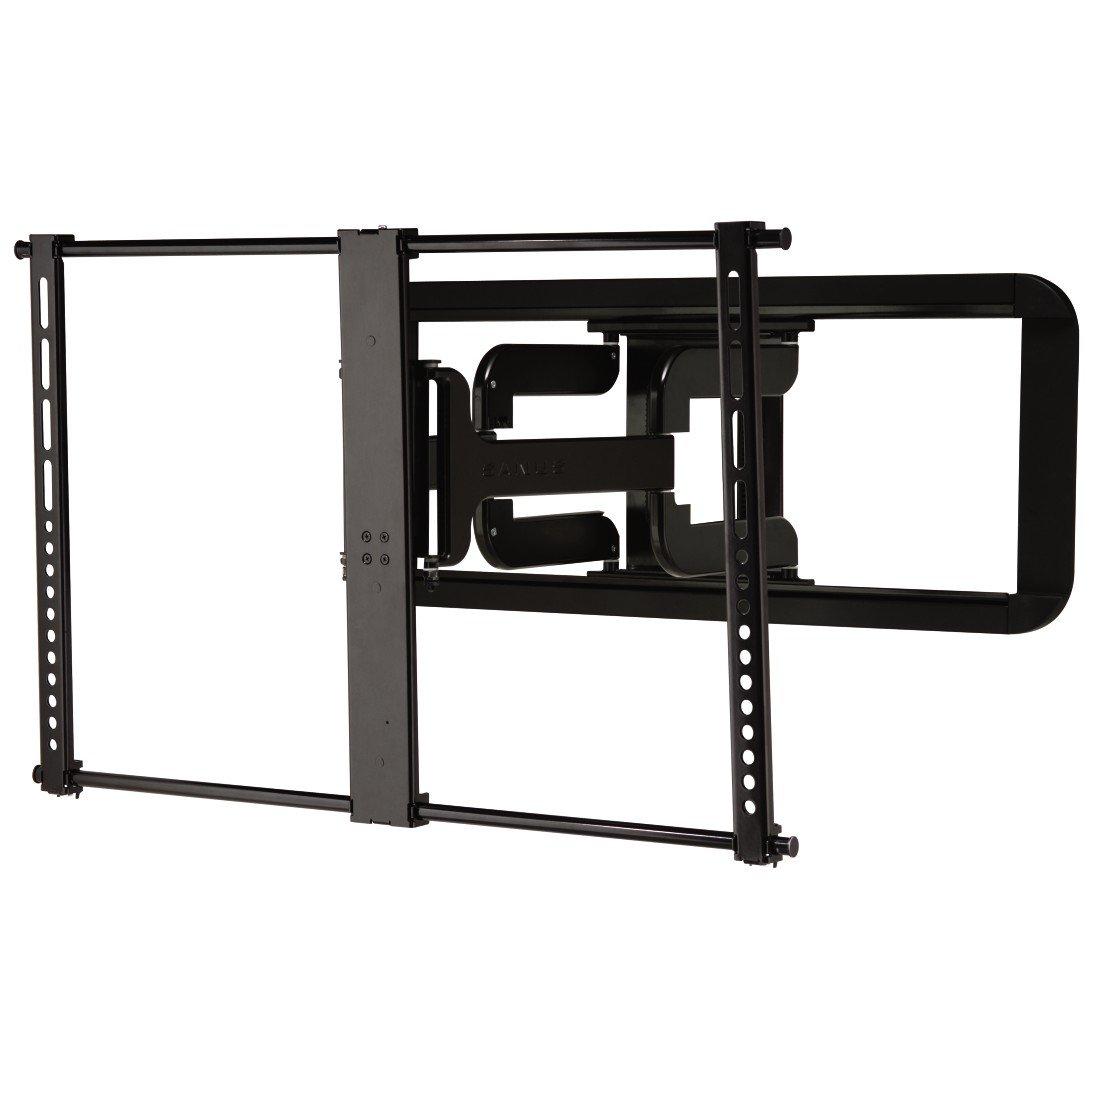 Milestone AV Technol 壁掛け金具 2段Wアーム超薄型フルモーション 対応TVサイズ 37~70V型 ブラック VLF320-B1   B0070B1NVC